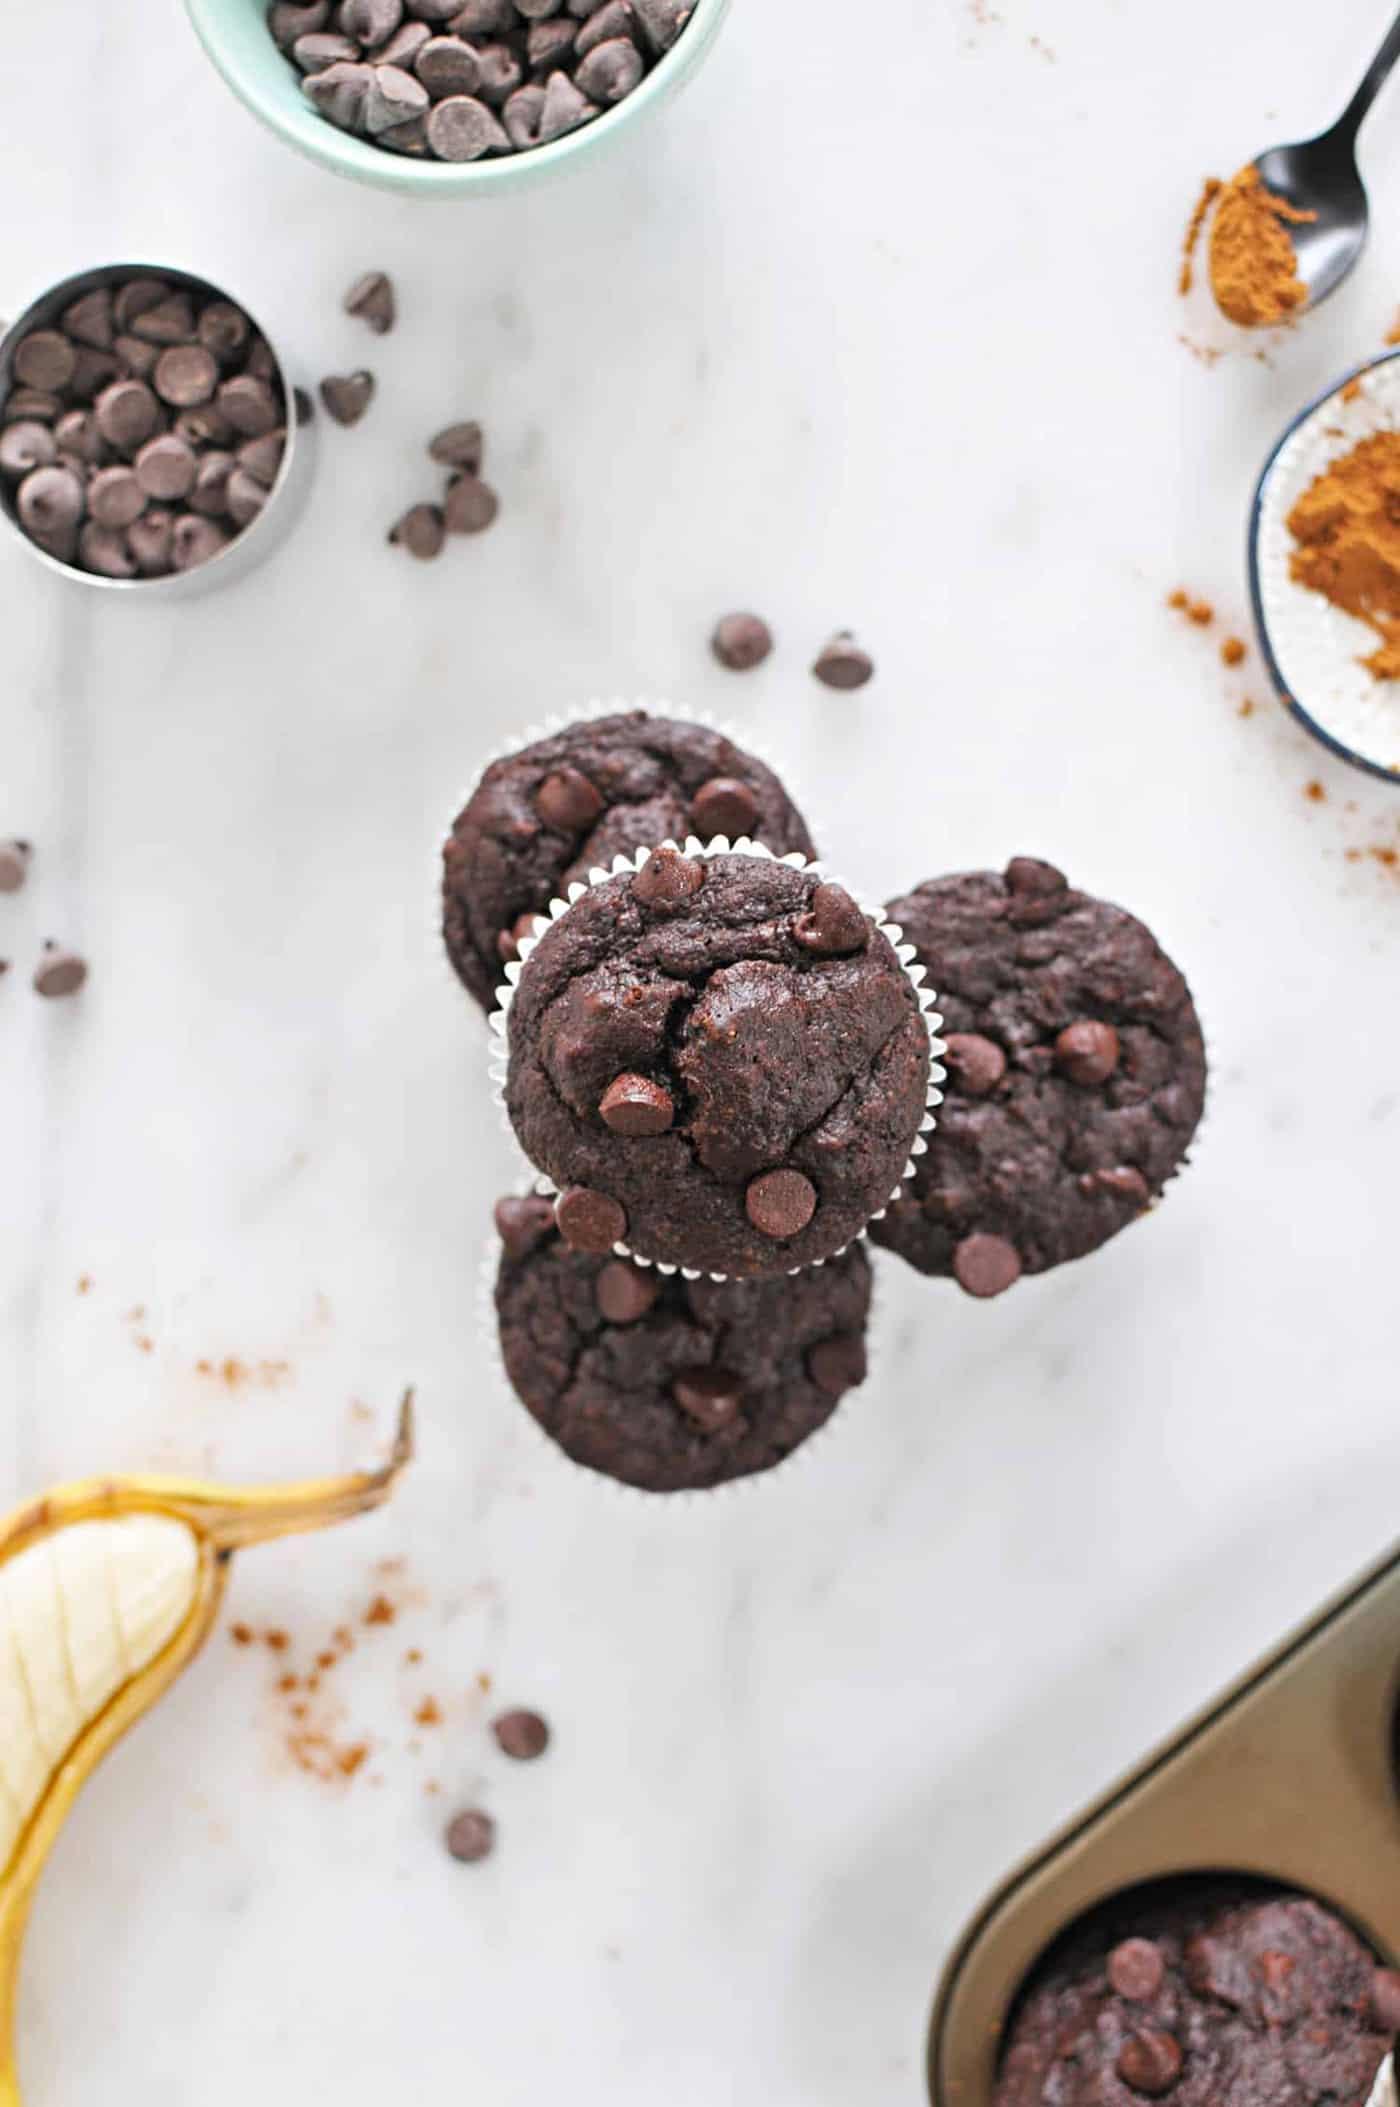 Mexican Chocolate Banana Muffins (Gluten-Free) recipe via thepigandquill.com #baking #dessert #sweets #breakfast